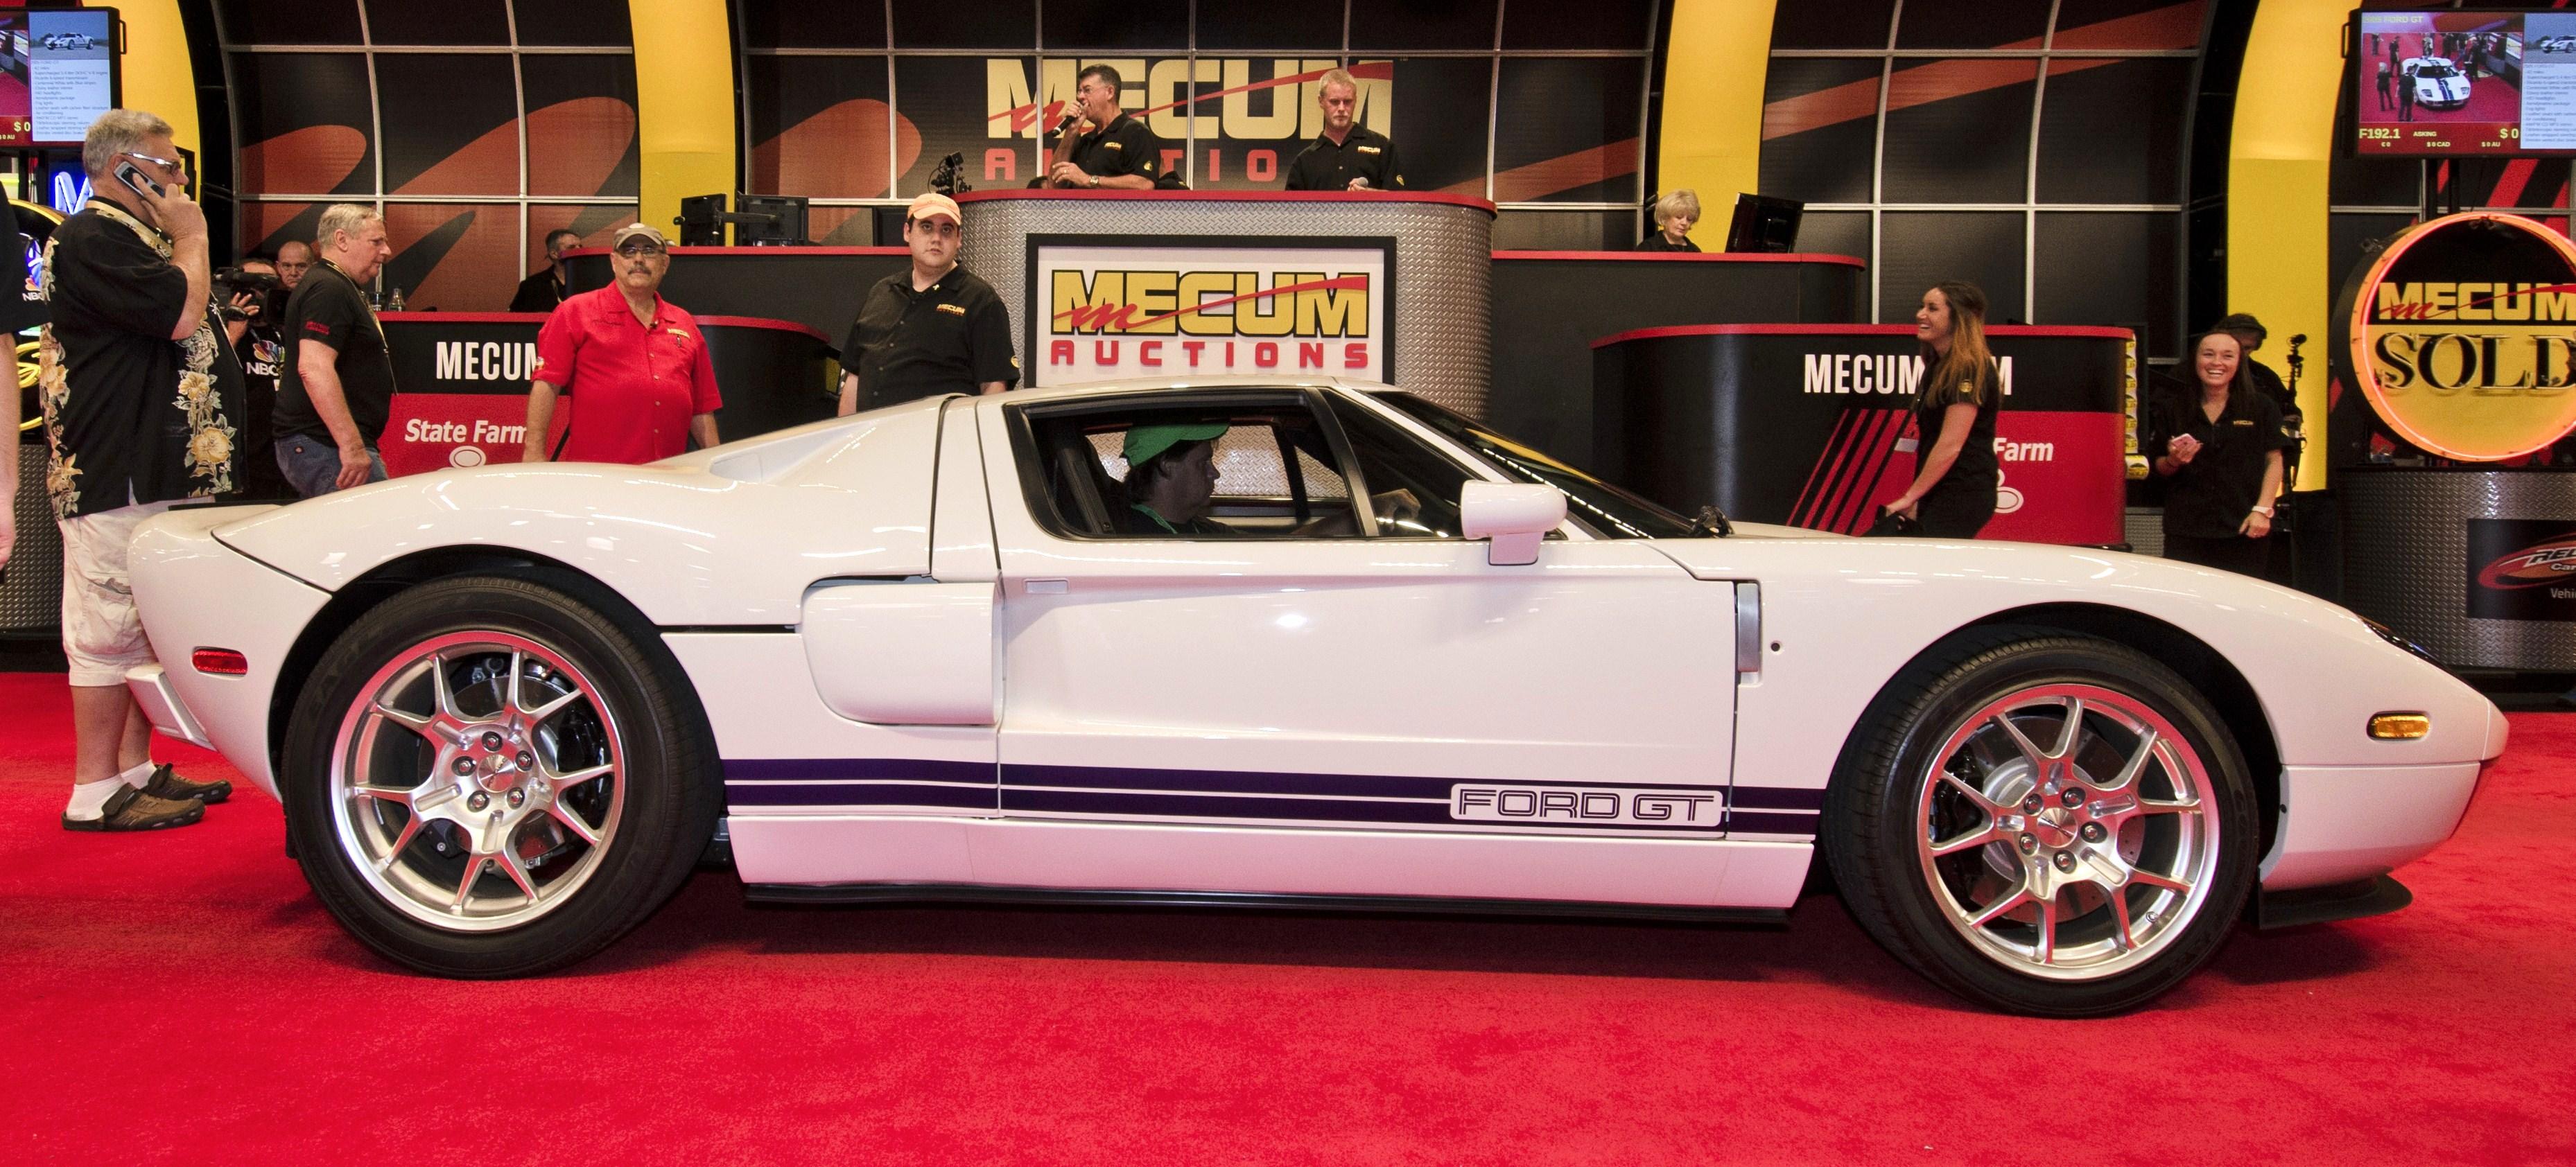 Mecum auction tops $31.4 million in Dallas - ClassicCars.com Journal